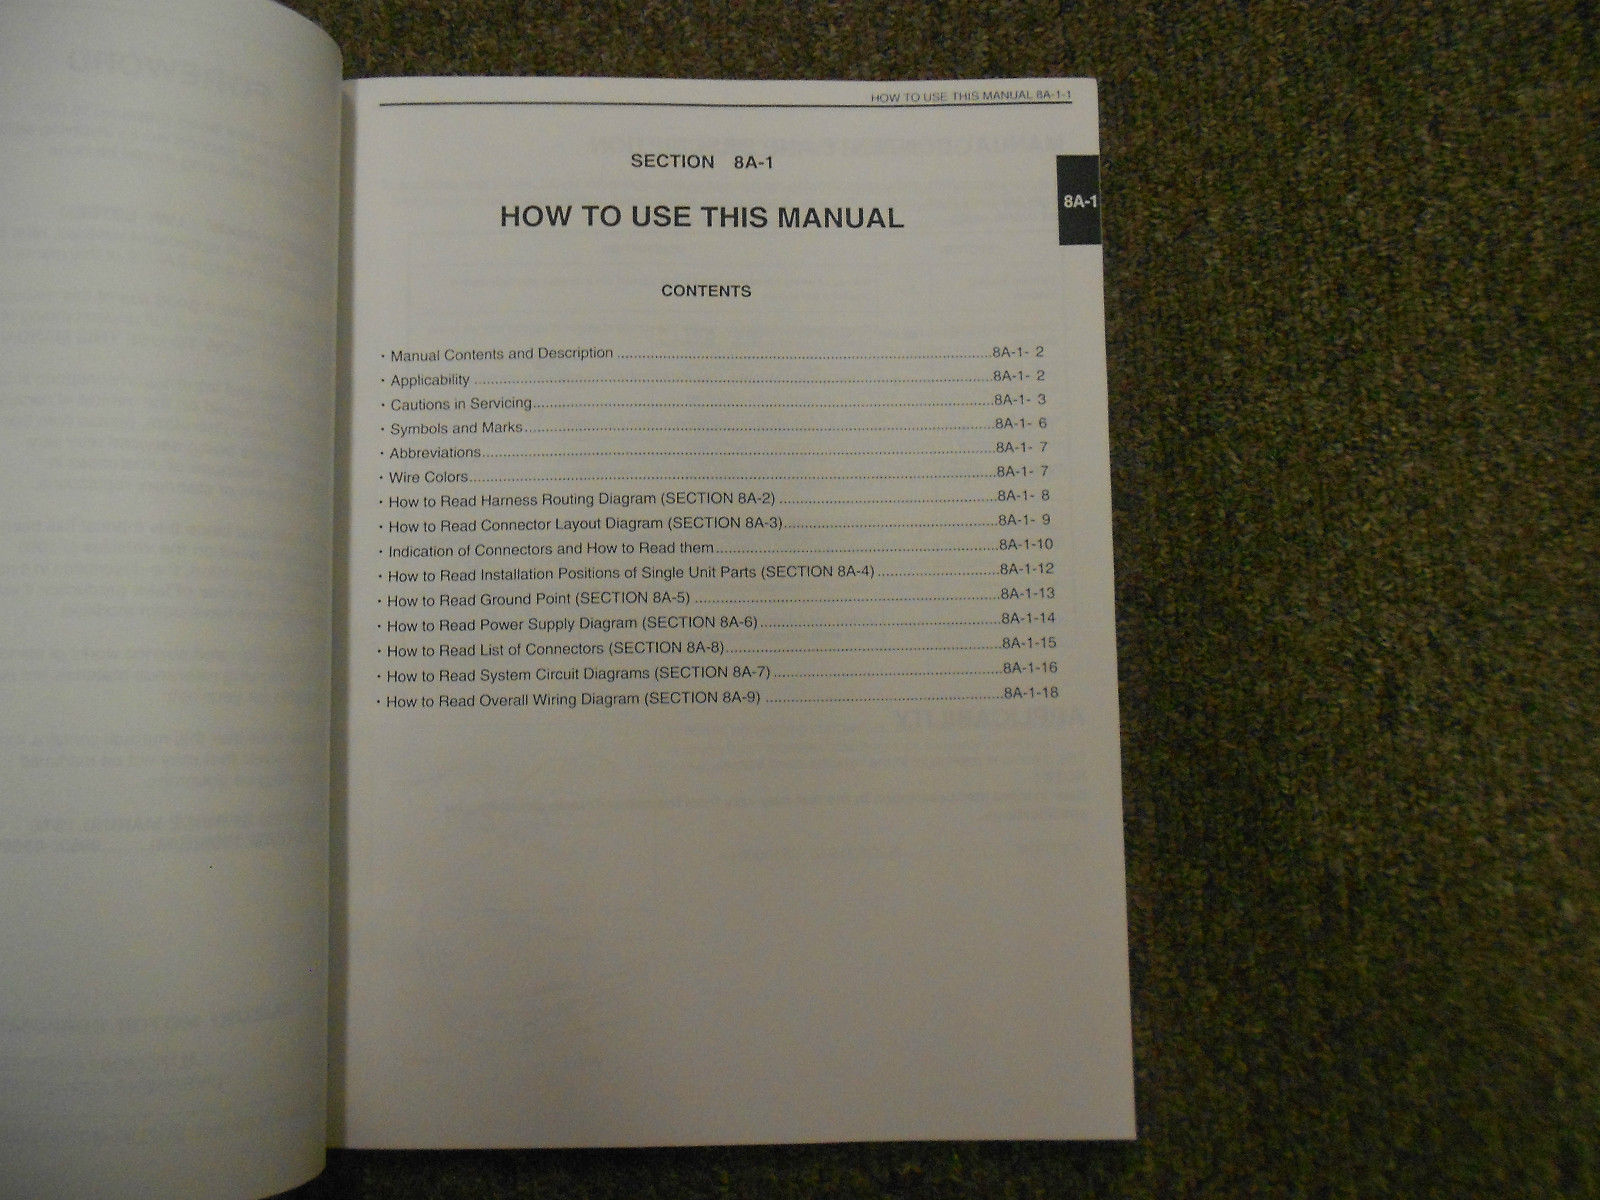 1995 Suzuki Esteem Wiring Diagram Shop Manual FACTORY OEM BOOK 95 2ND ED U.S VOL image 3